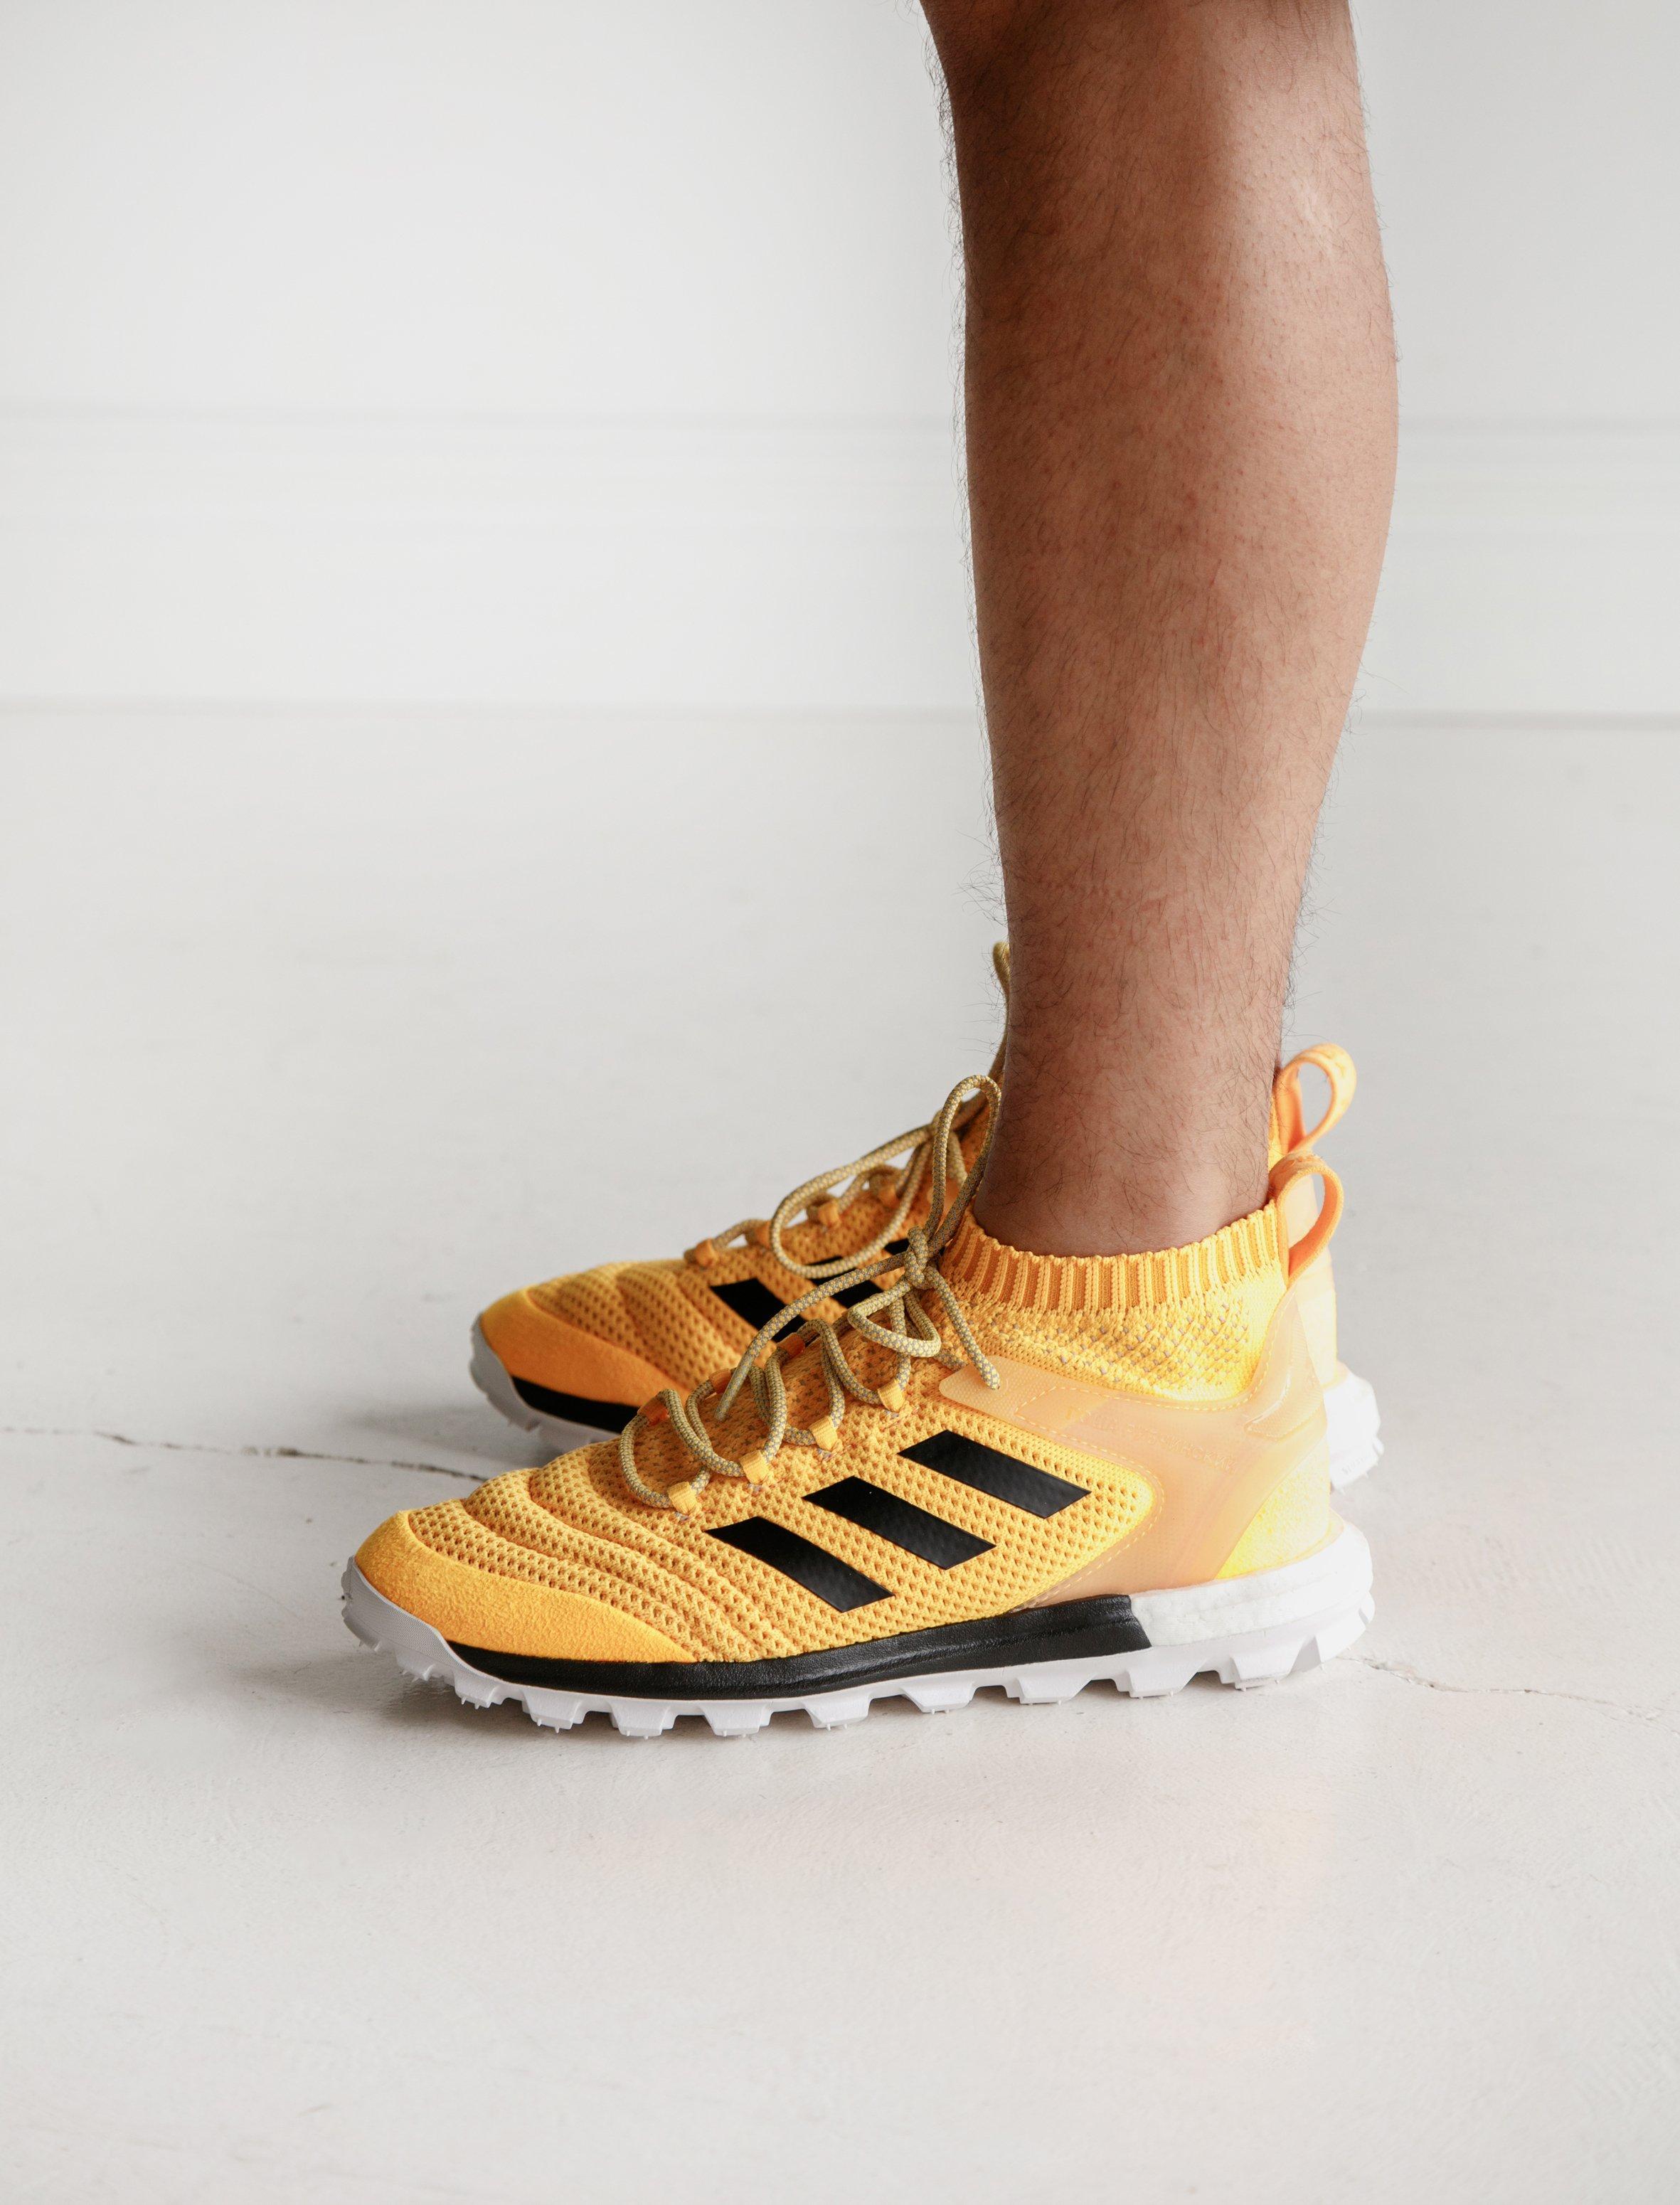 sports shoes 6e94b 74968 Gosha Rubchinskiy Adidas Copa PK Mid Sneaker Orange